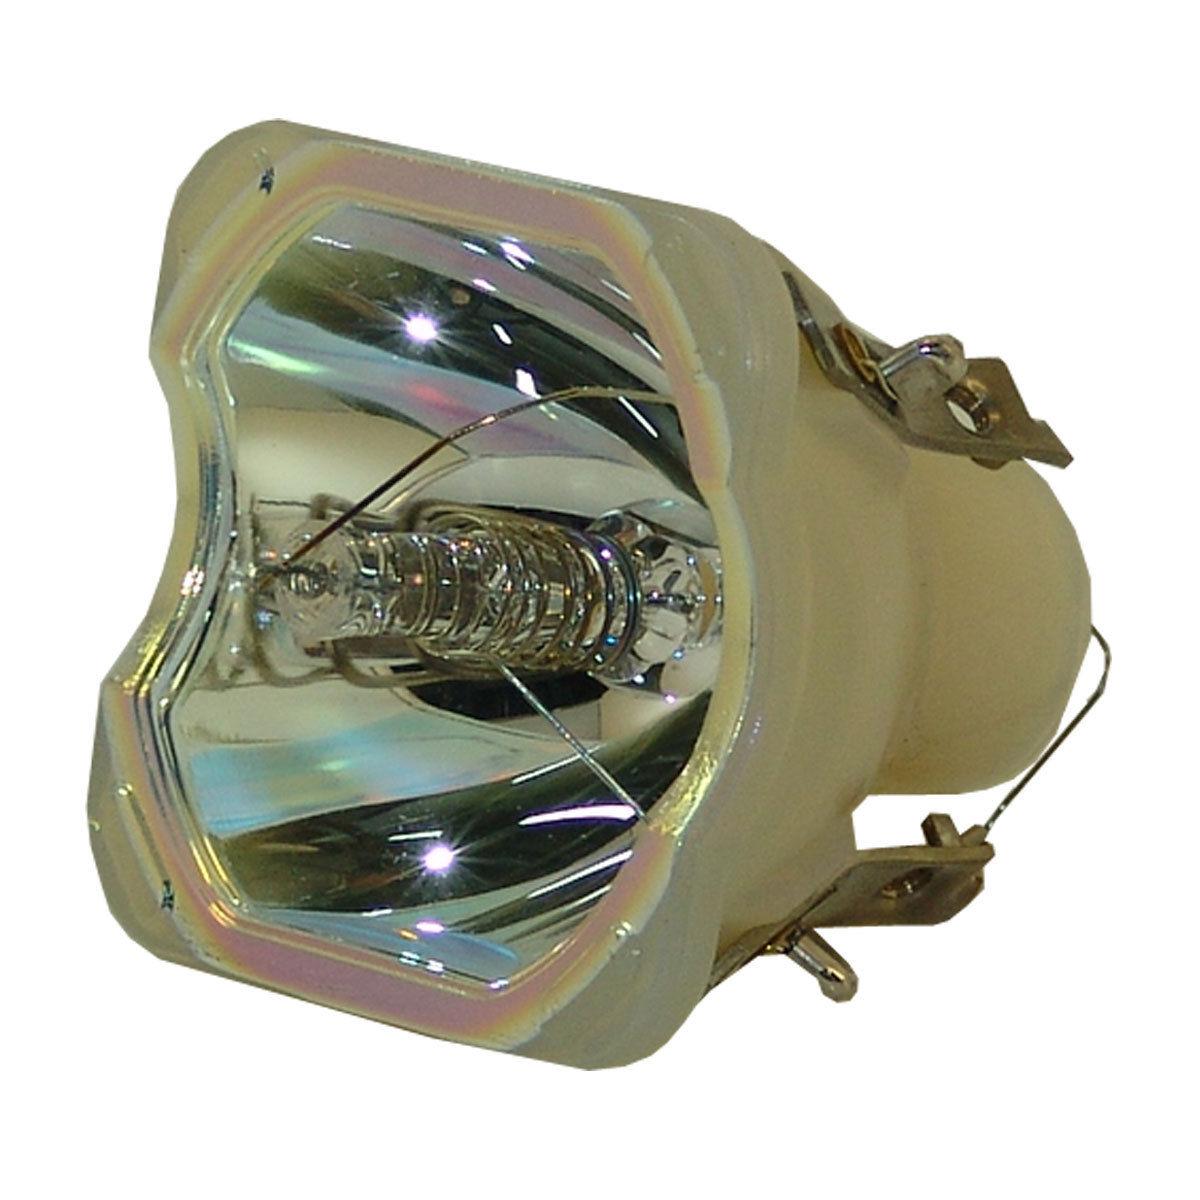 Comapatible Bare Bulb LMP-D200 LMPD200 for Sony VPL-DX10 VPL-DX11 DX11 VPL-DX15 DX15 Projector Bulb Lamp without housing original replacement projector lamp bulb lmp f272 for sony vpl fx35 vpl fh30 vpl fh35 vpl fh31 projector nsha275w